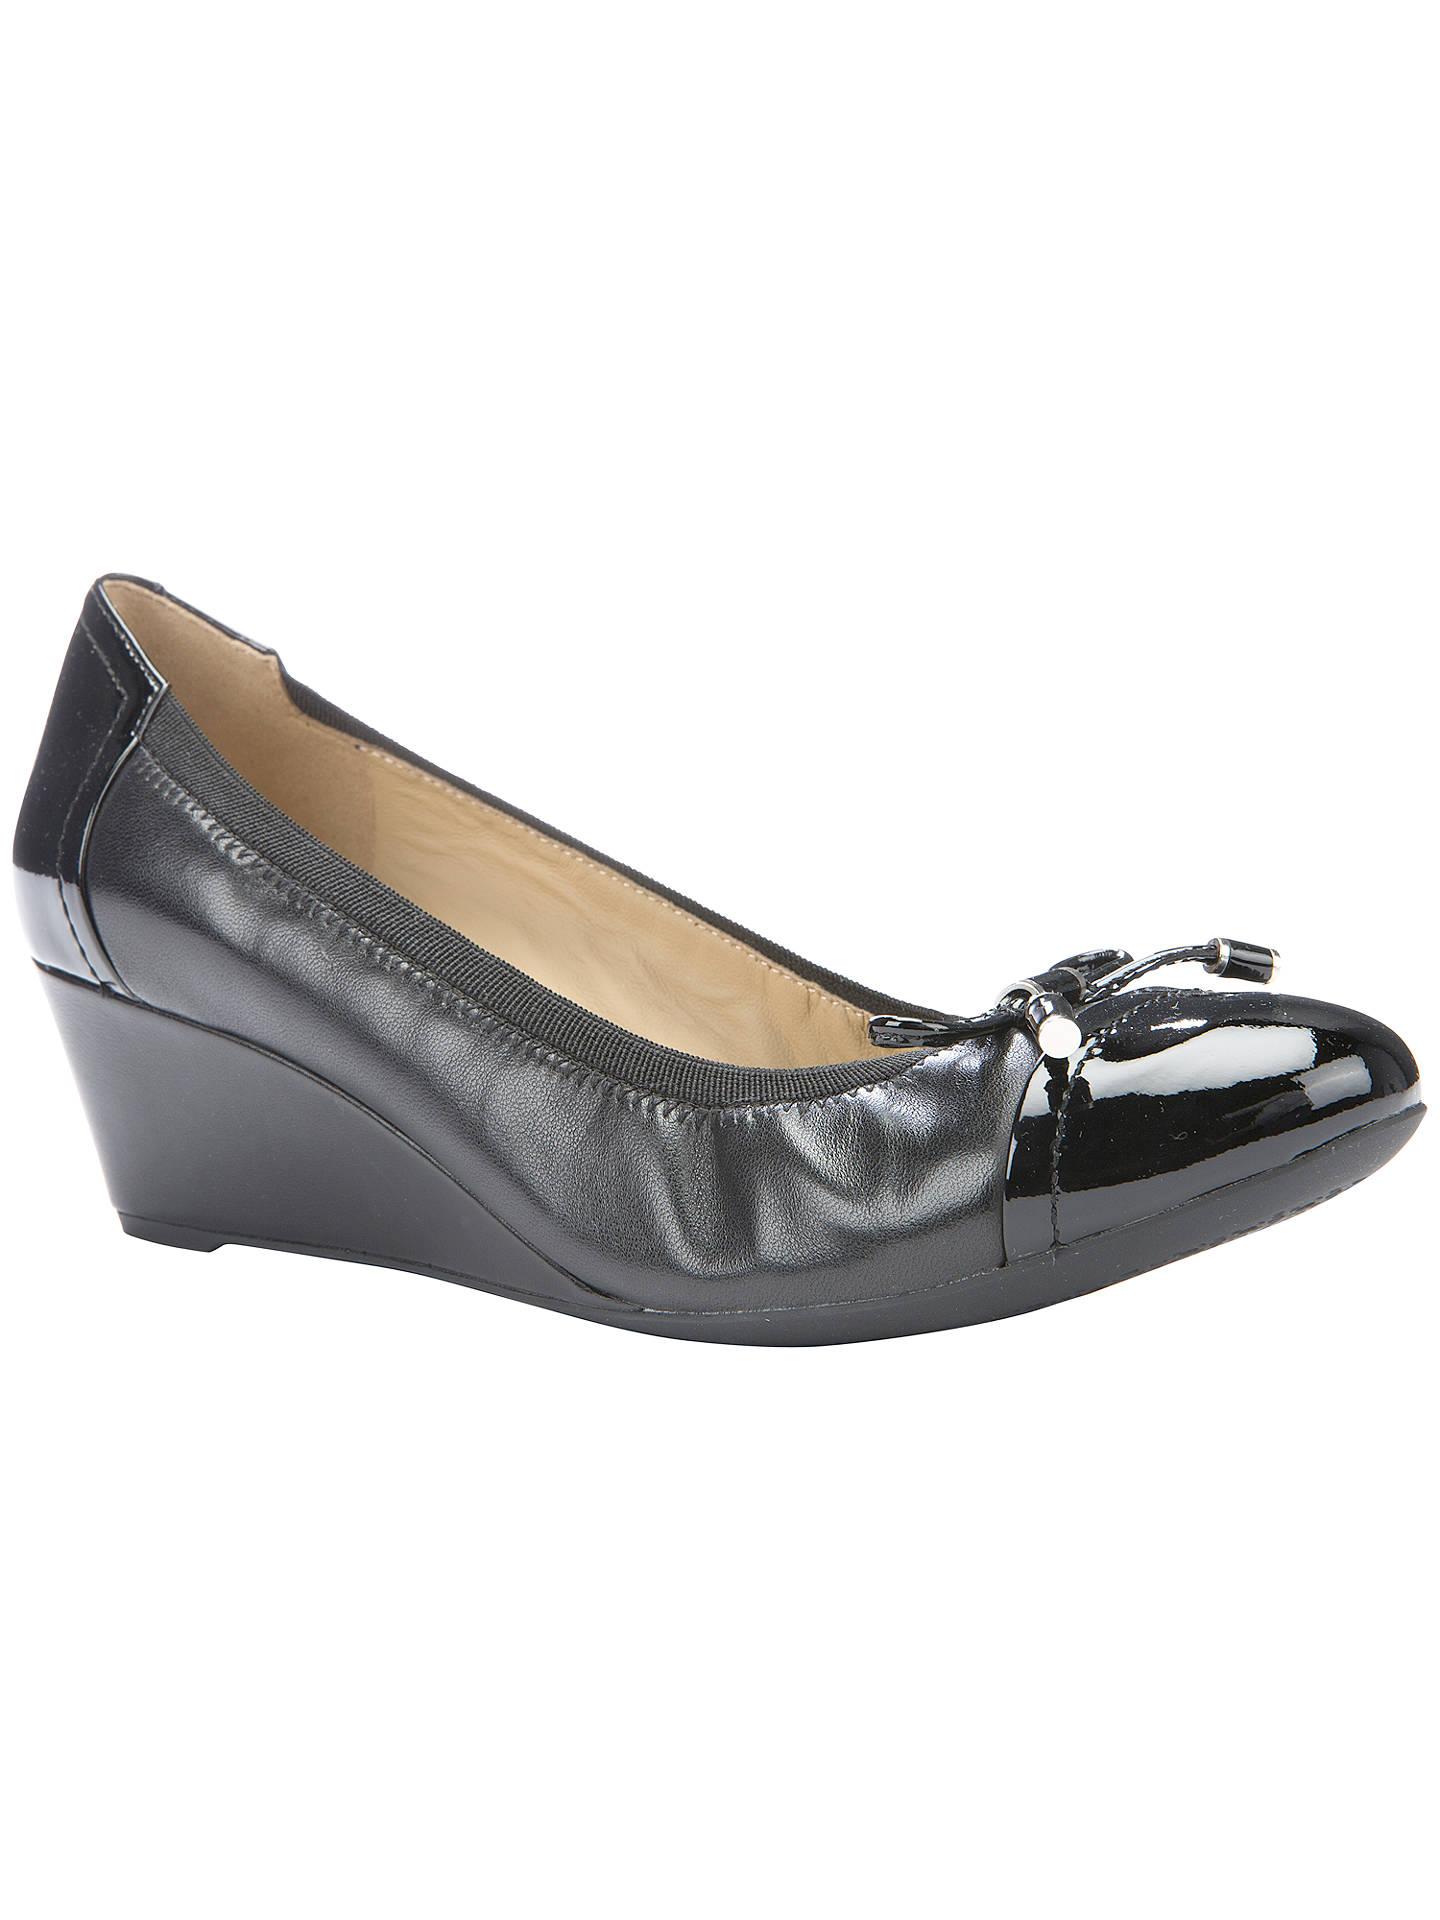 db0a9a2b1c7 Buy Geox Women s Floralie Wedge Heel Ballet Pumps